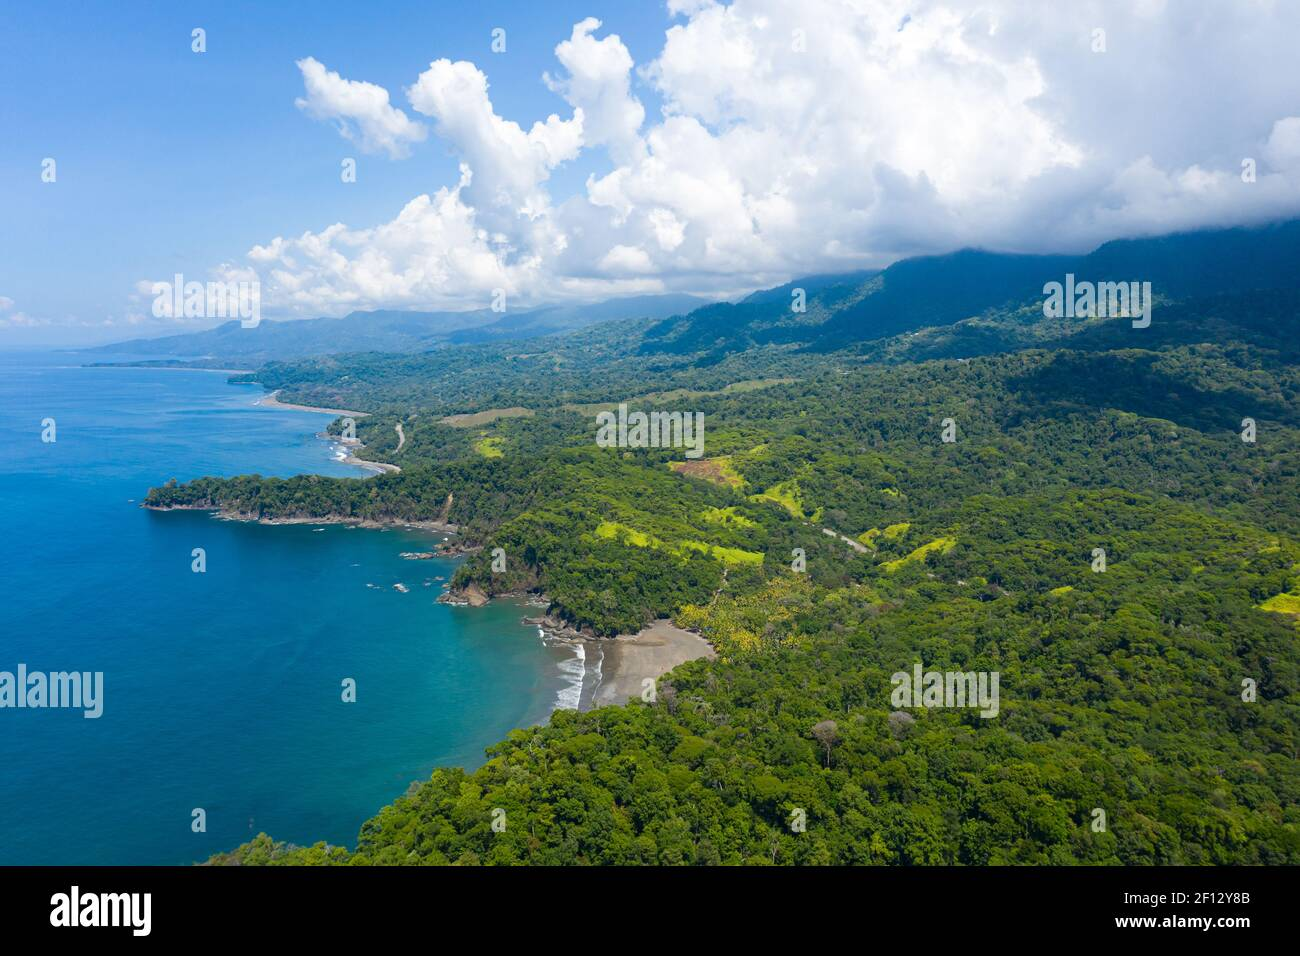 Landscape of a beautiful exotic Ventana beach located in the Costa Ballena, Uvita, South Pacific coast of Costa Rica. Stock Photo